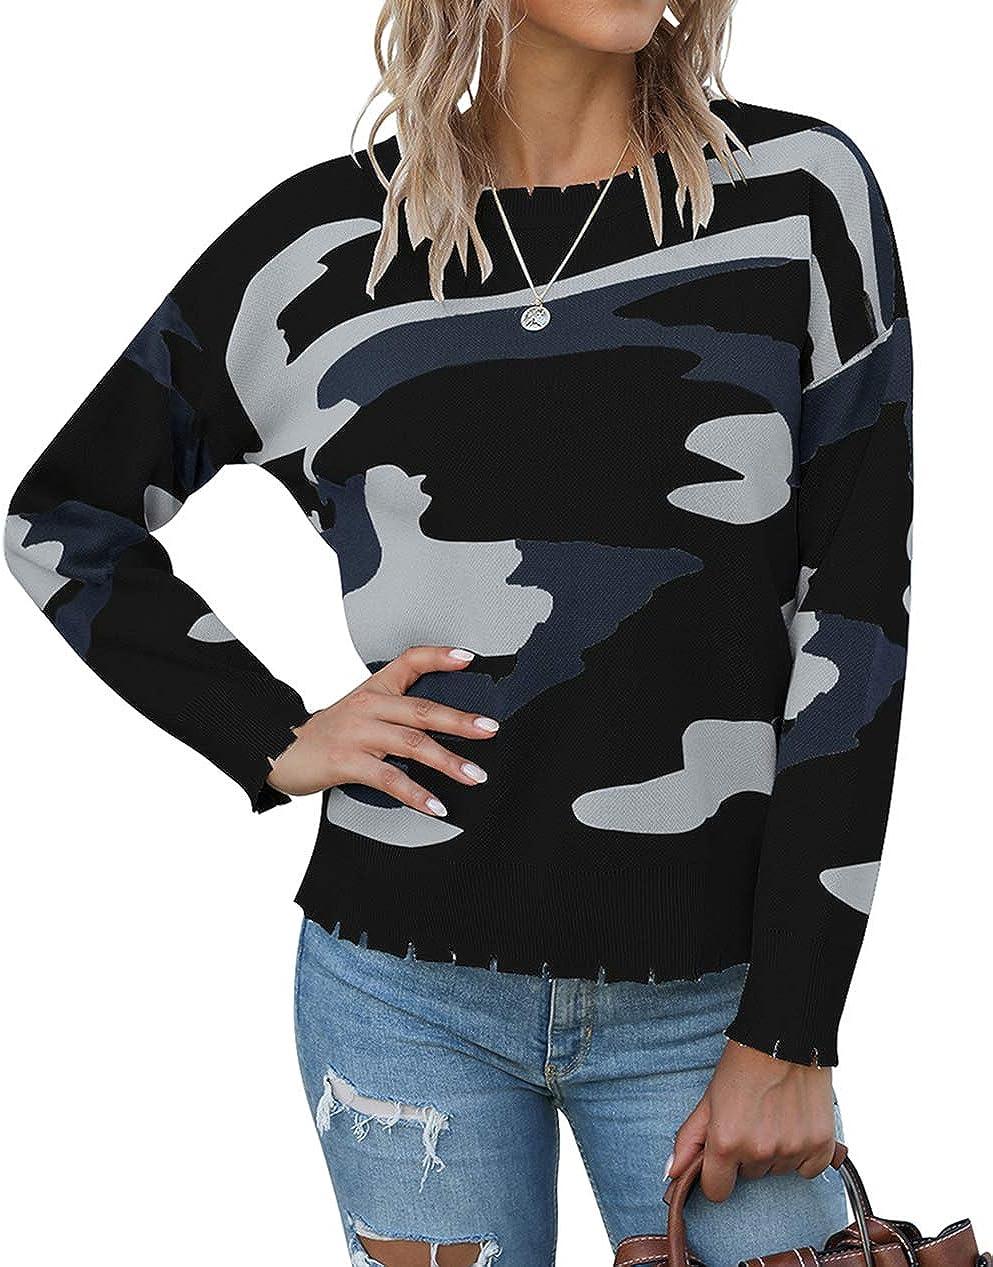 KIRUNDO 2021 Women's Japan Maker New Winter Knitted Camouflage Swea store Printed